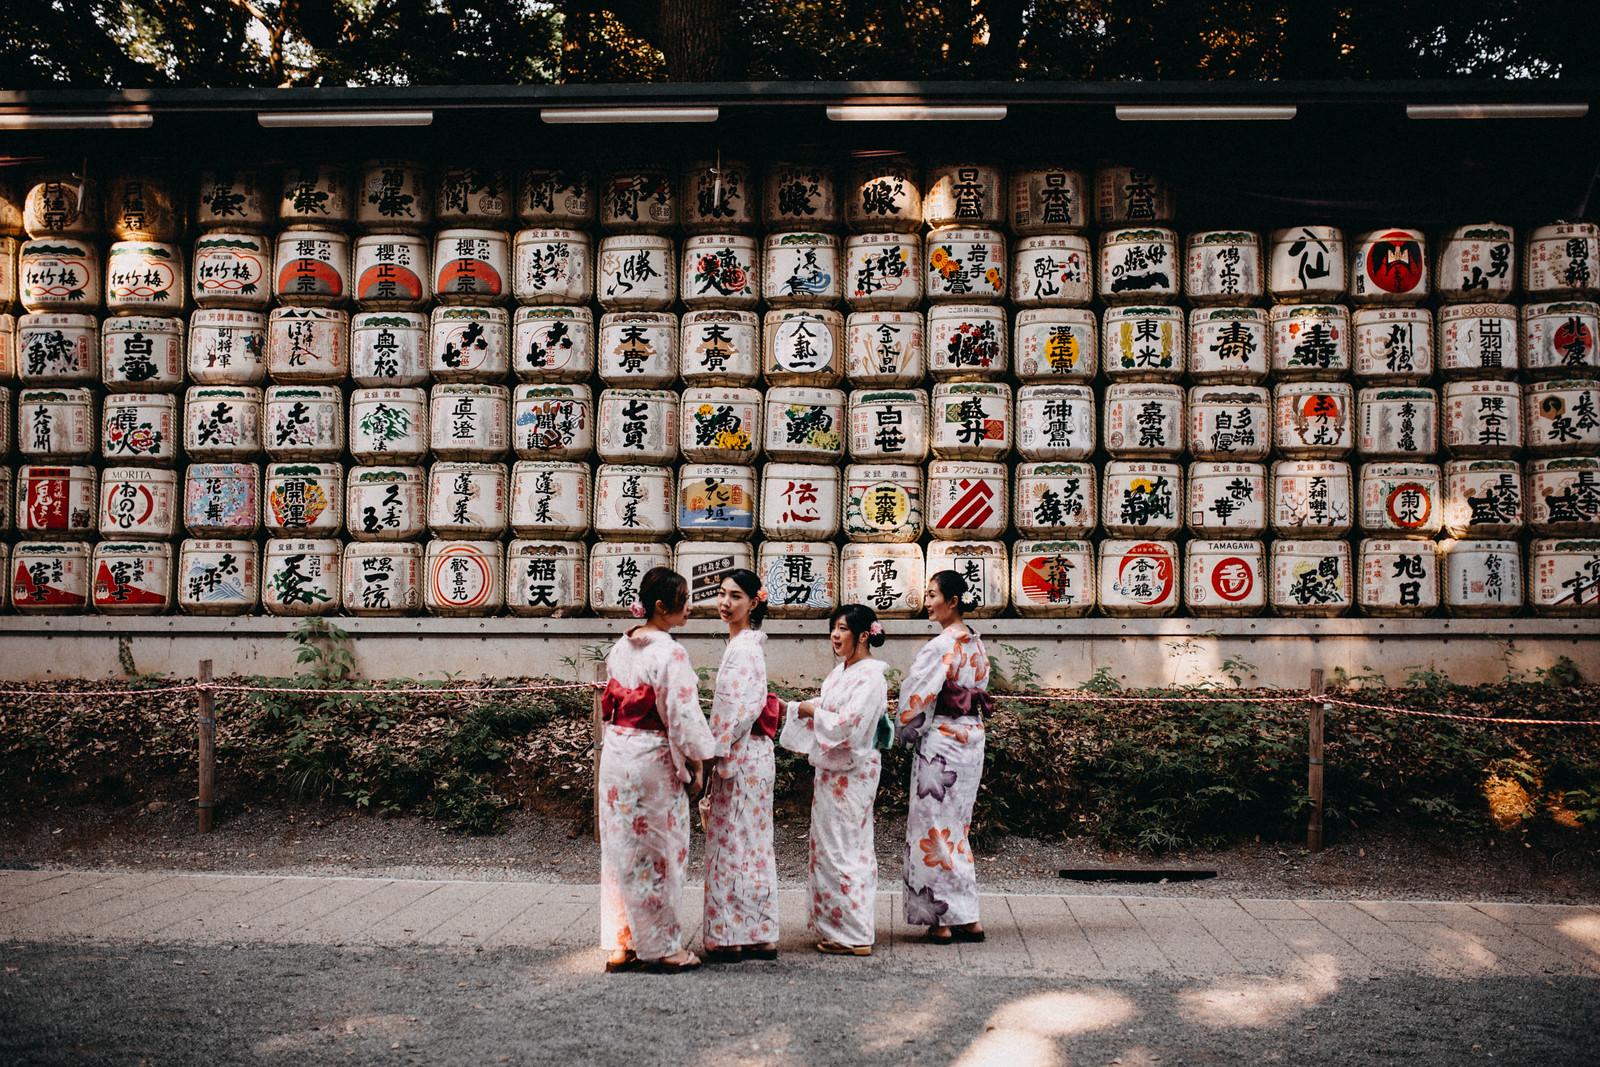 Japanese Women in traditional kimonos at Meiji Jingu Shrine in Yoyogi Park Tokyo Japan